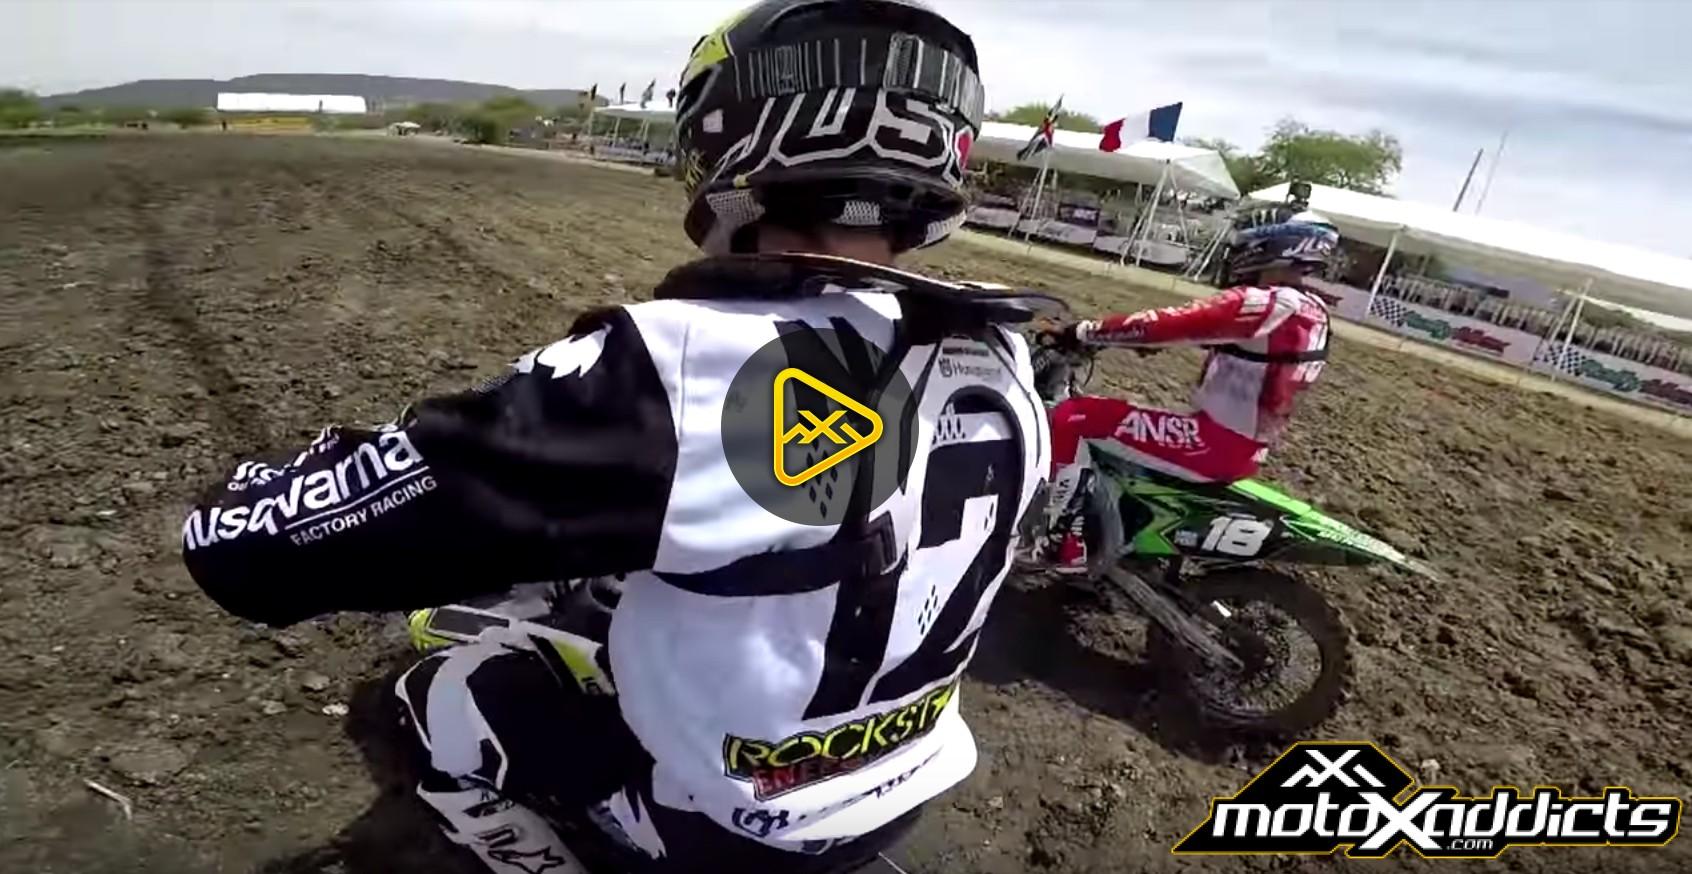 2017 MXGP of Leon (Mexico) GoPro Lap Preview